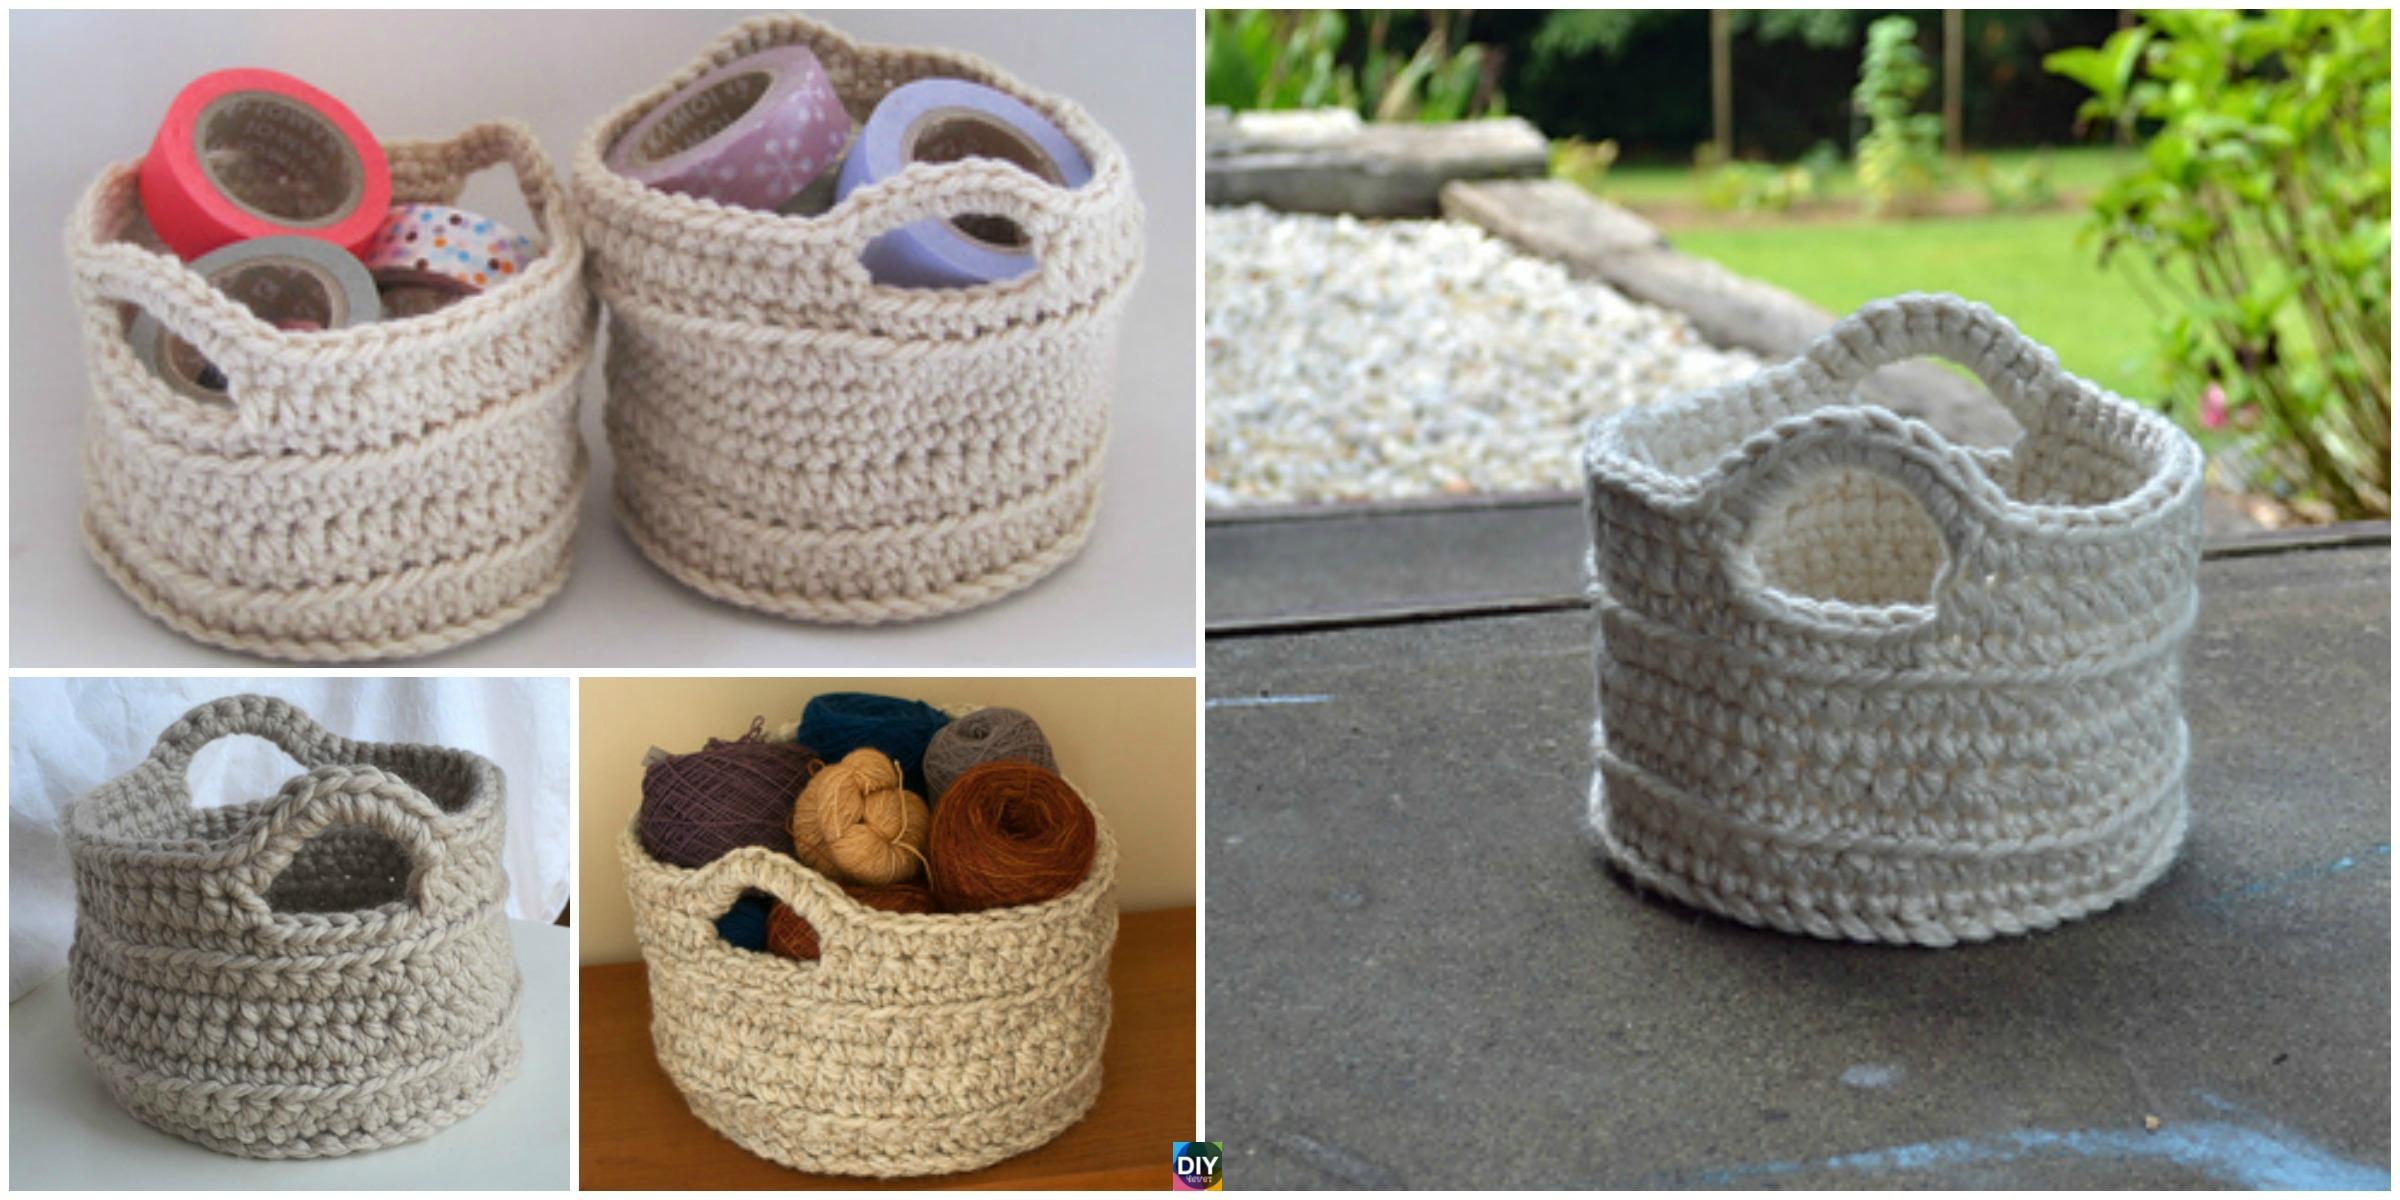 Chunky Crochet Basket - Free Pattern - DIY 4 EVER